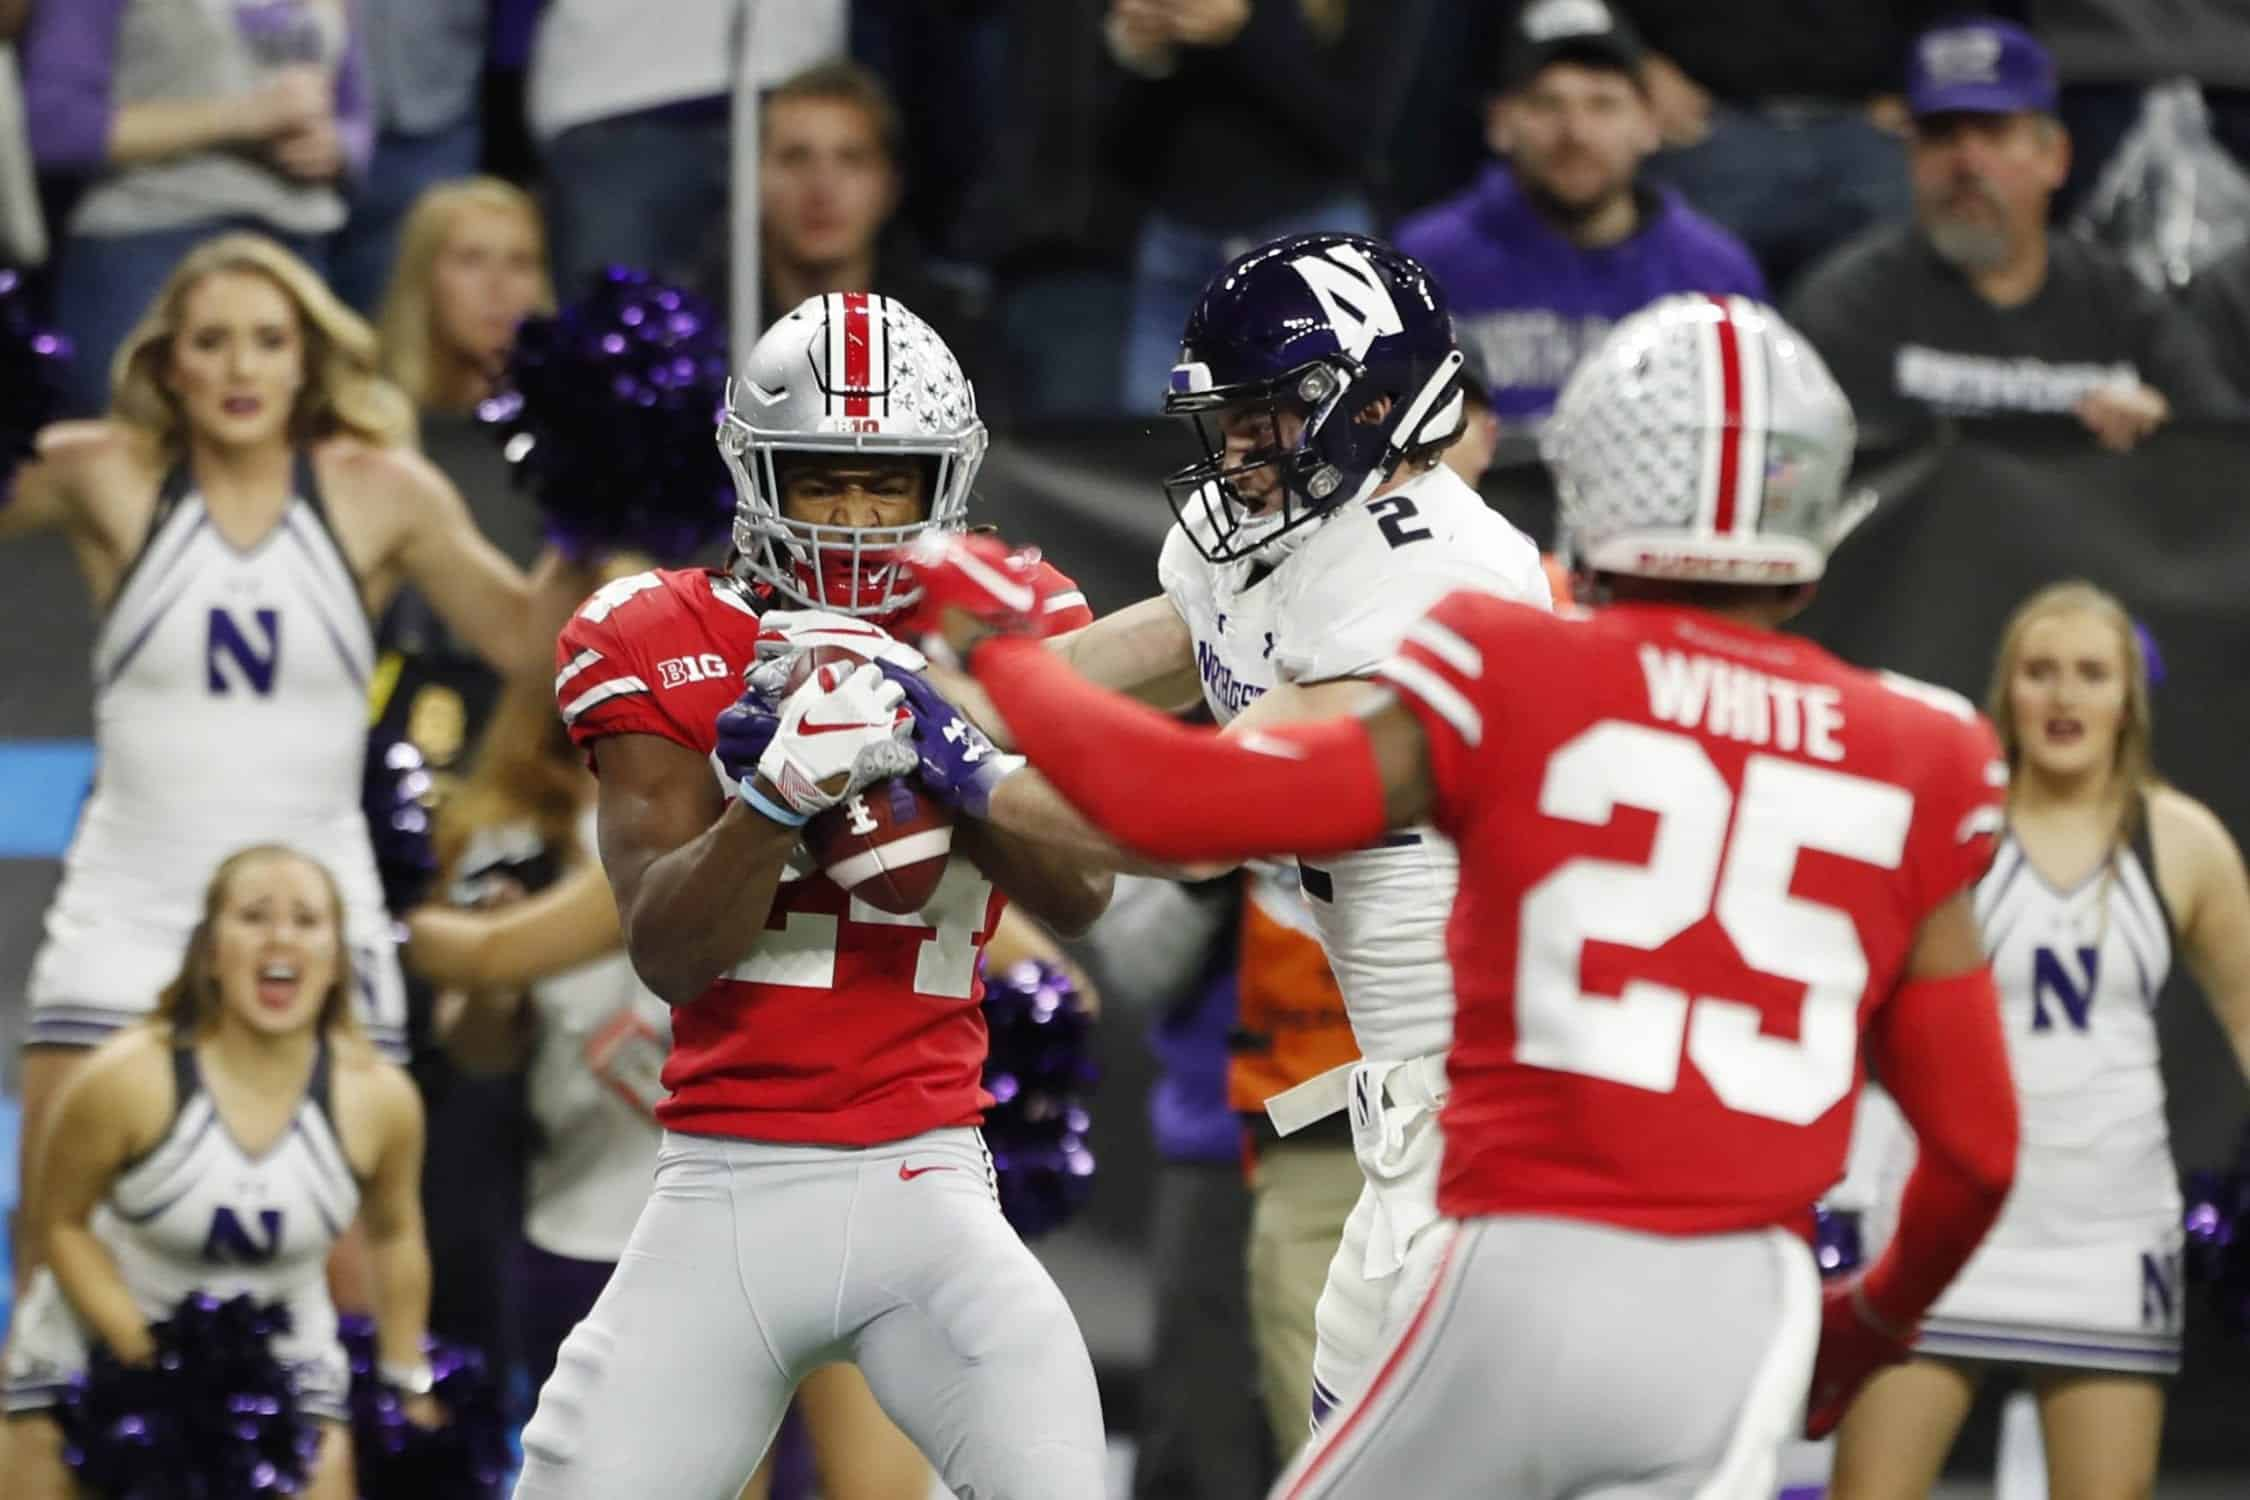 2021 NFL Draft: Is Shaun Wade the next great Ohio State cornerback?